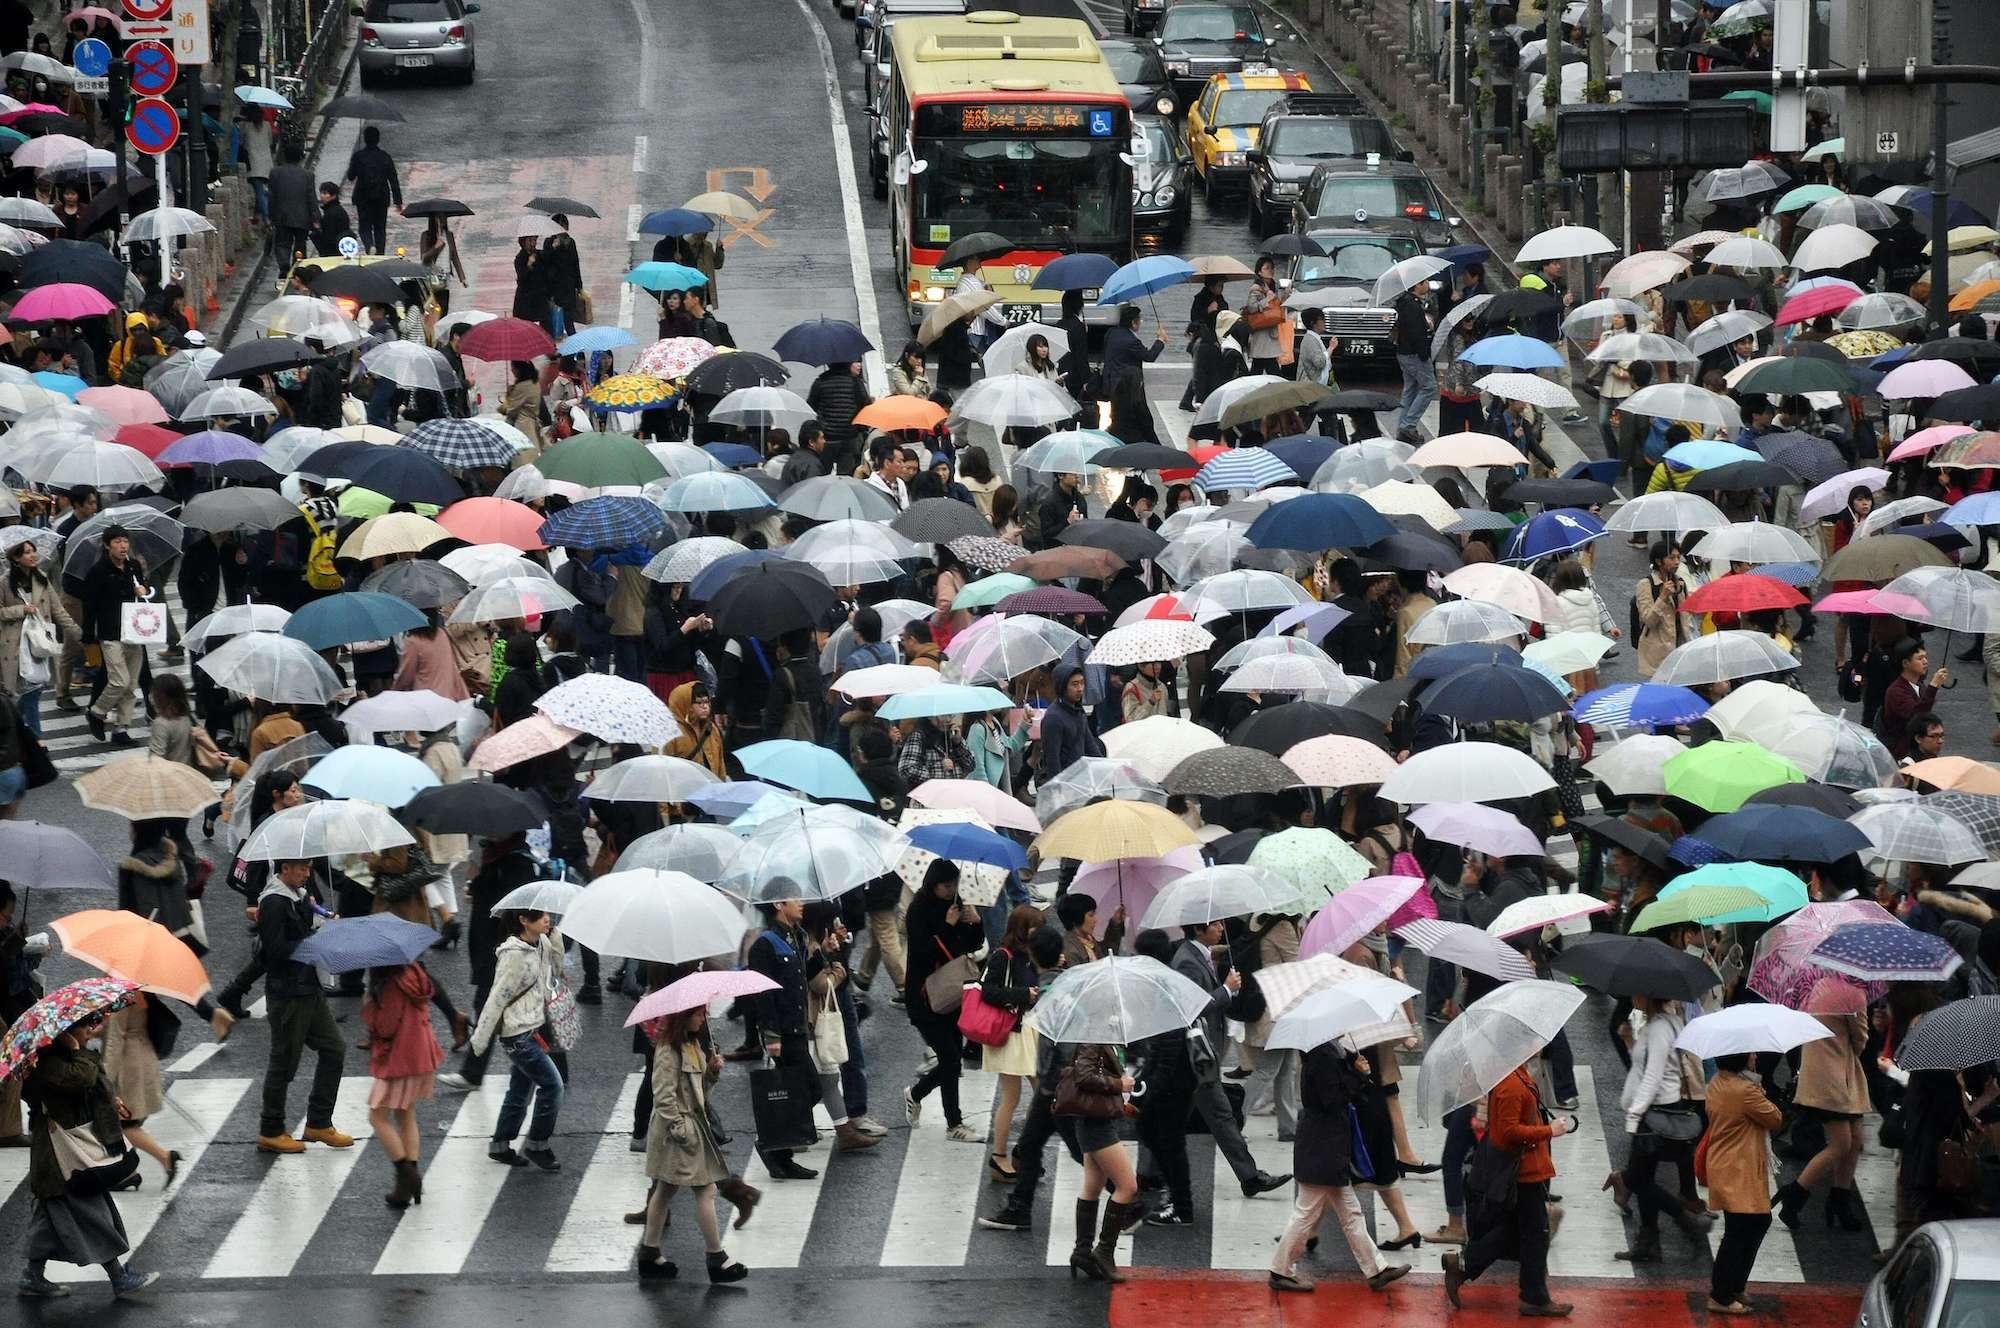 10 tips to survive the Japanese Rainy Season